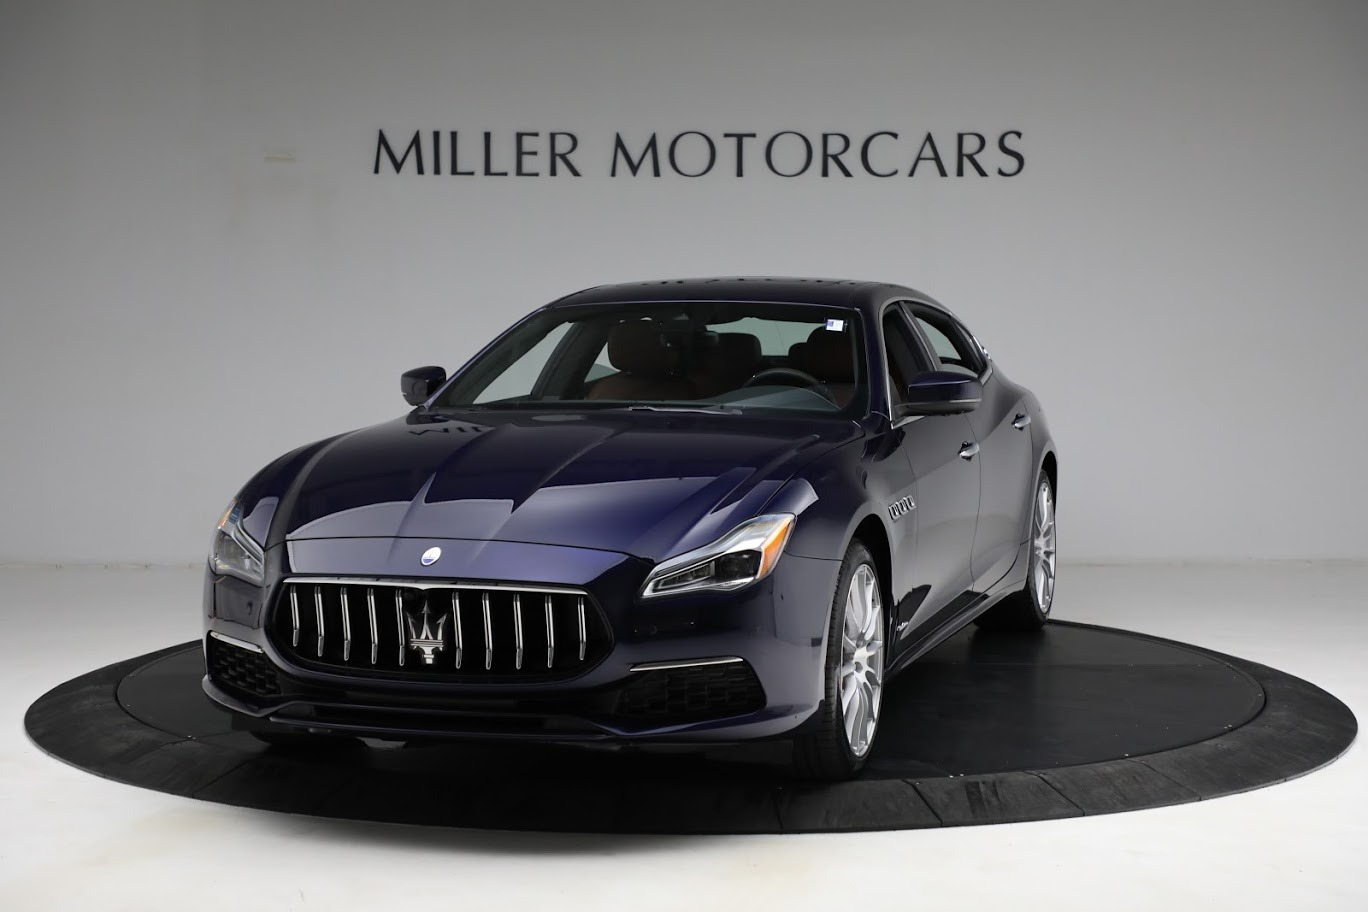 New 2021 Maserati Quattroporte S Q4 GranLusso for sale $125,149 at Bentley Greenwich in Greenwich CT 06830 1